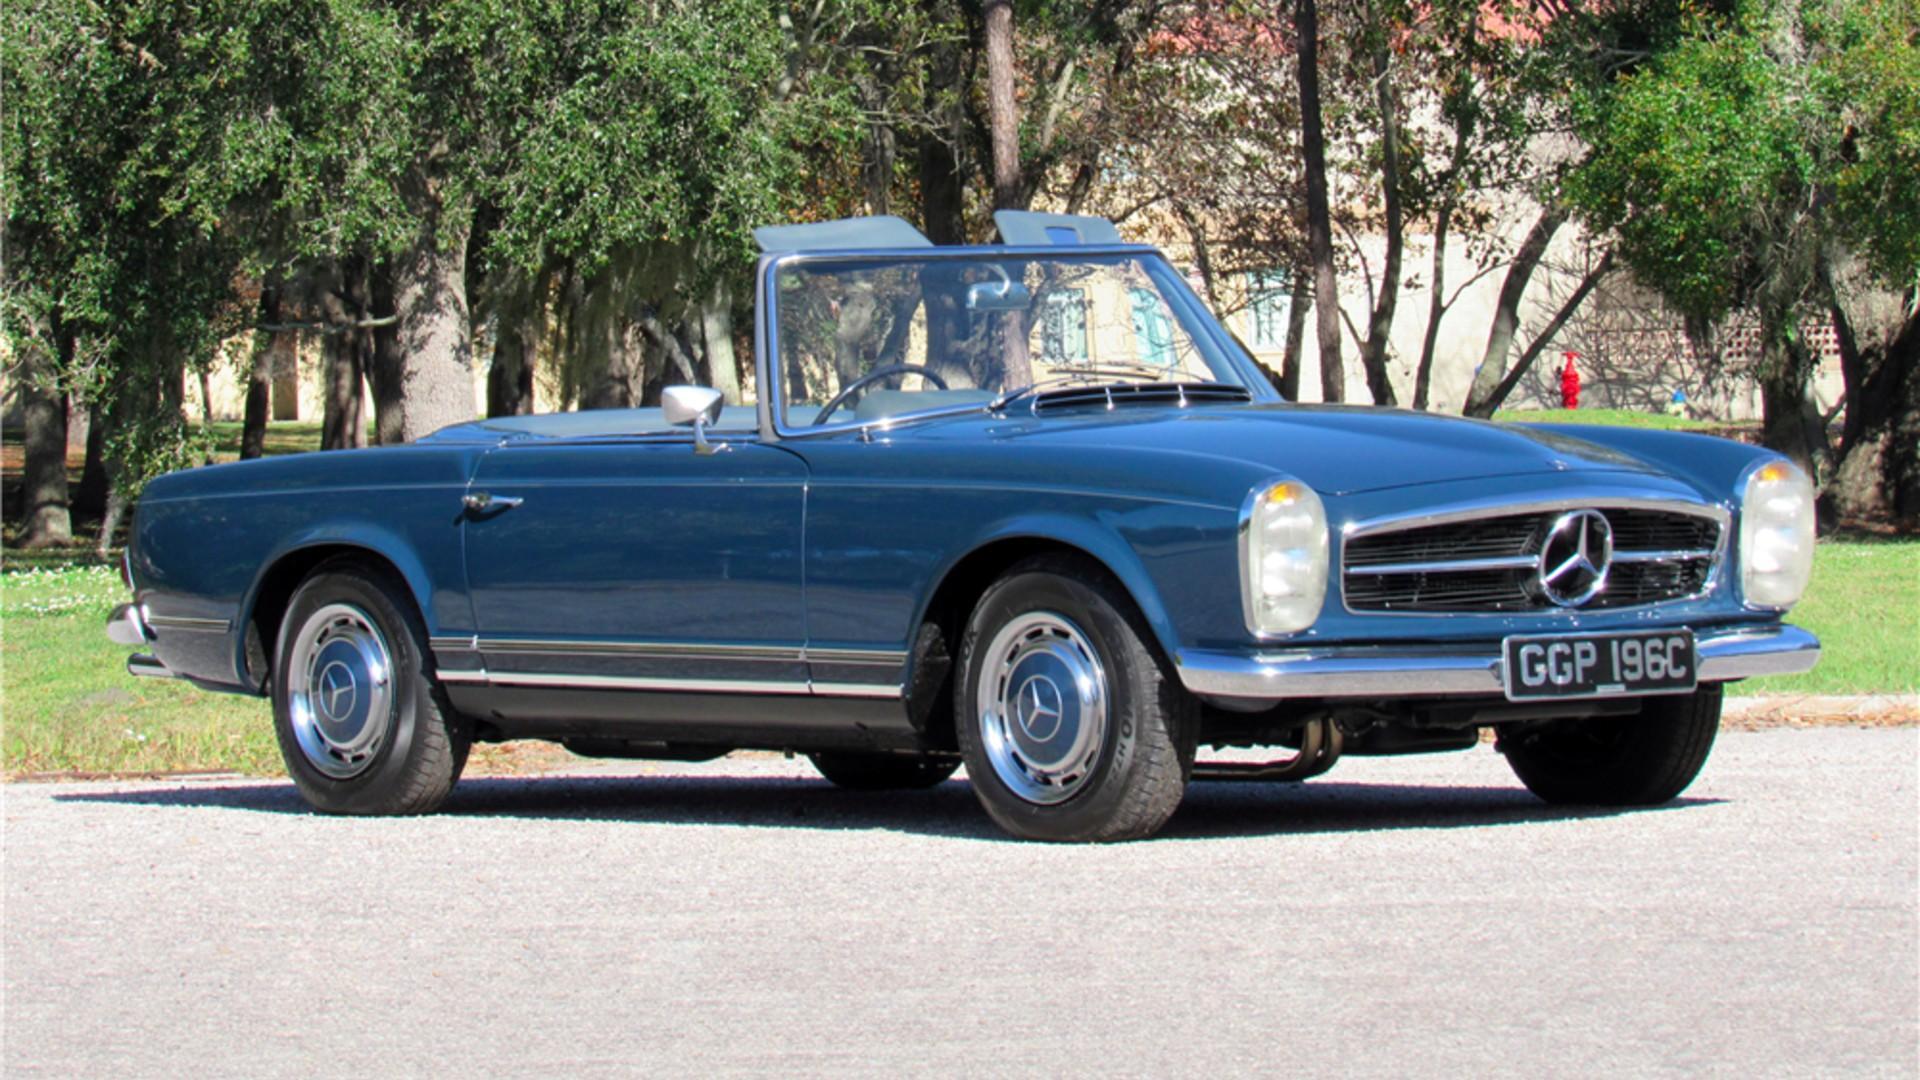 John Lennon's 1965 Mercedes-Benz 230SL heads to auction